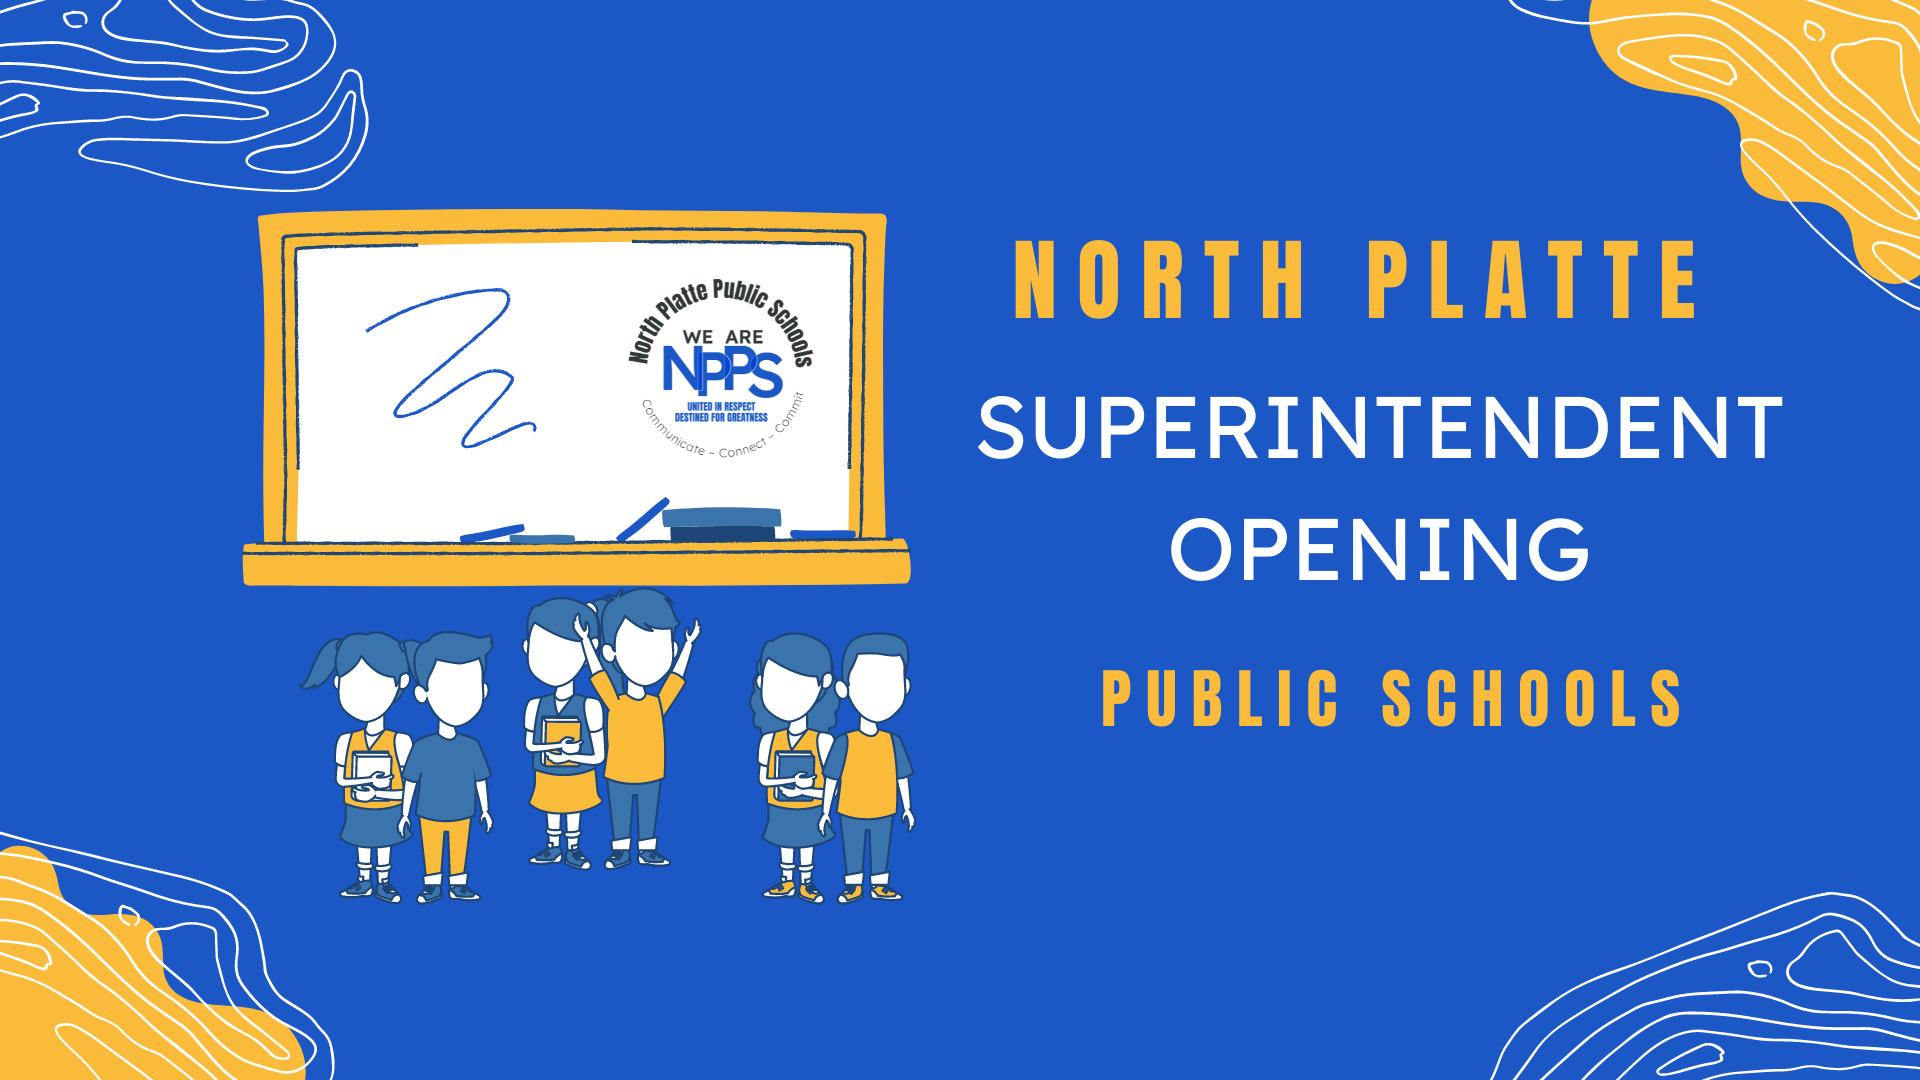 Superintendent Opening